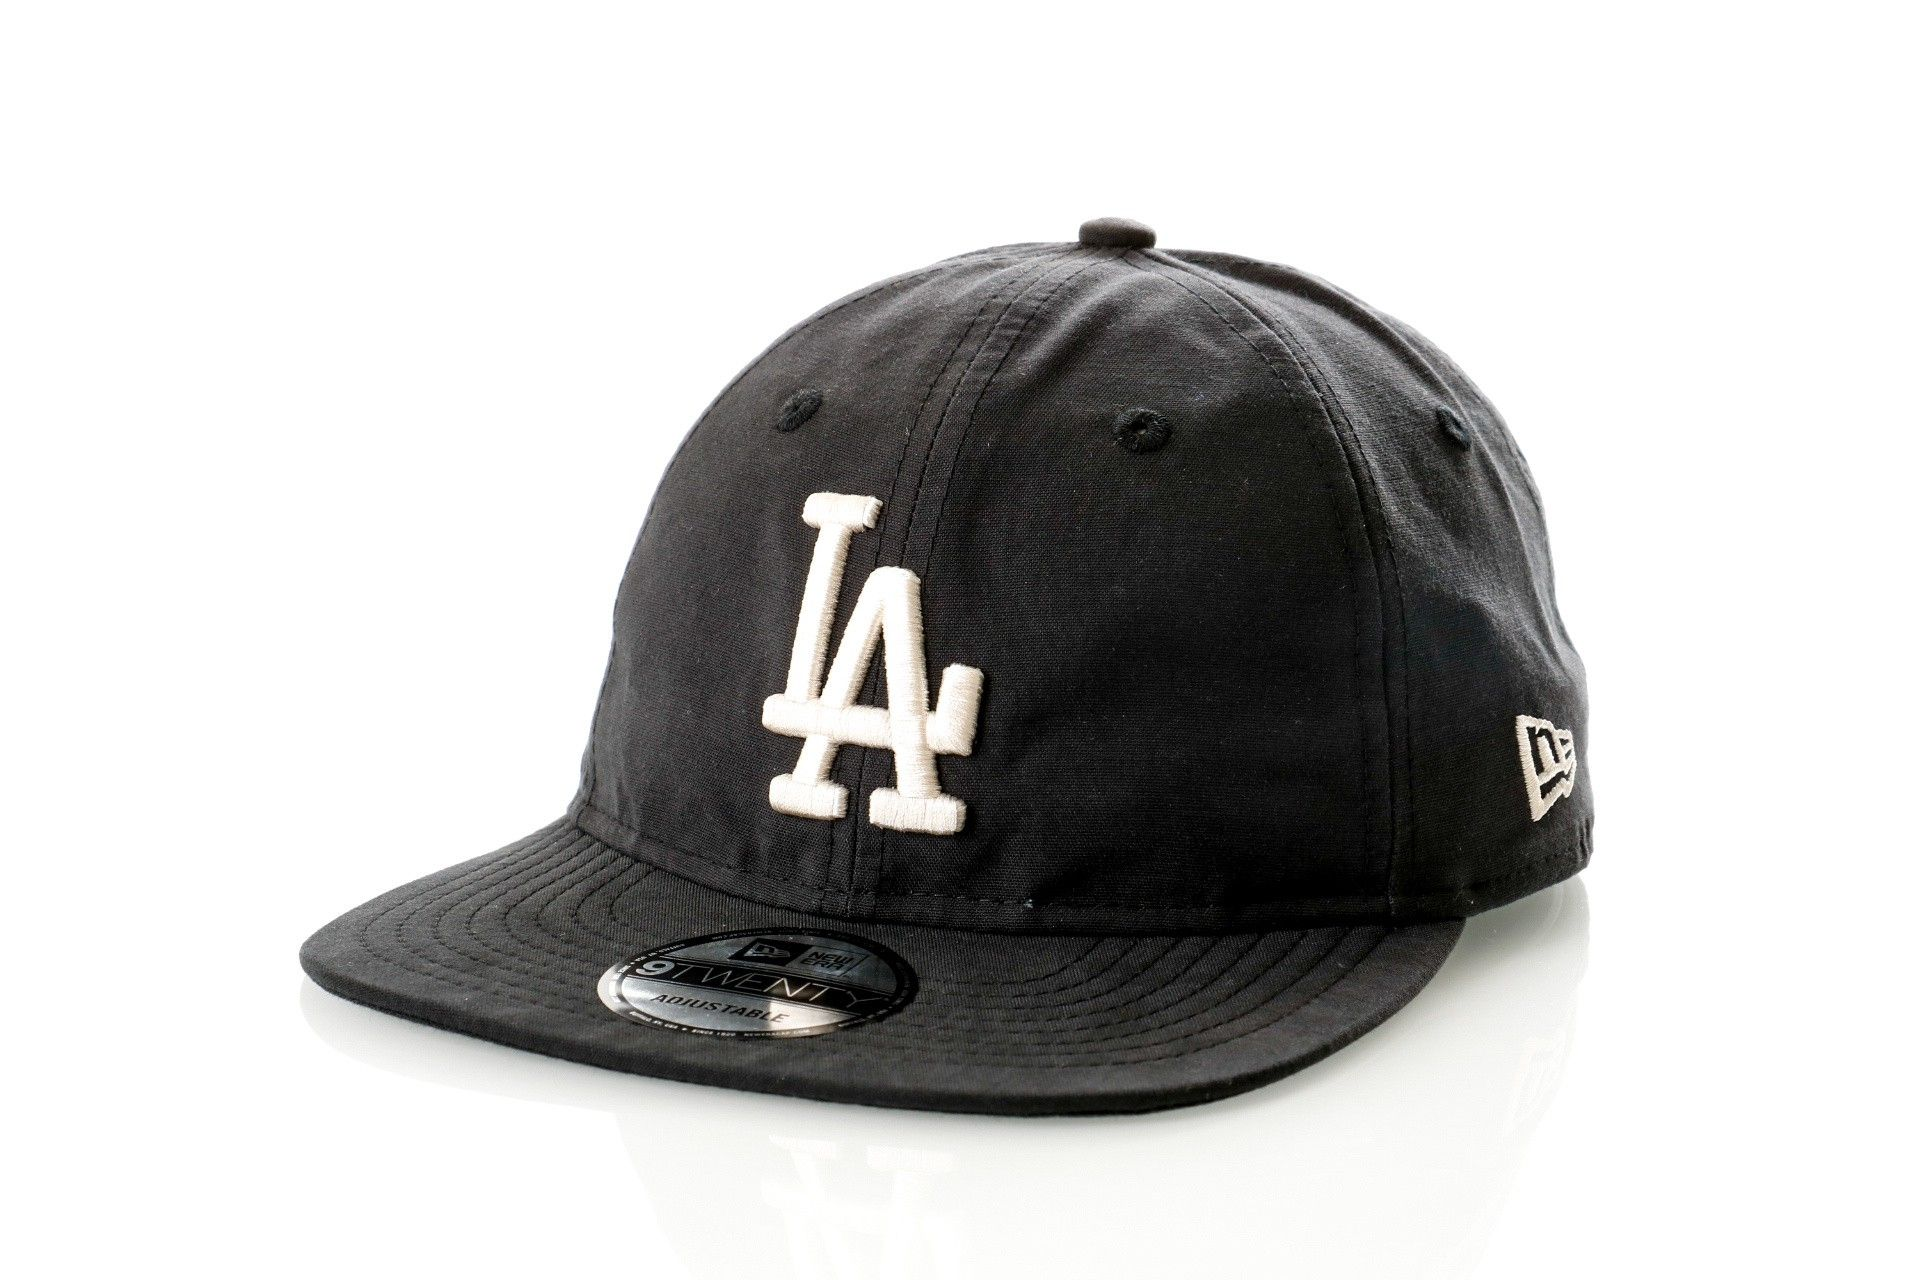 Afbeelding van New Era Dad cap Light Weight Nylon Packable Black/Optic White 11746793